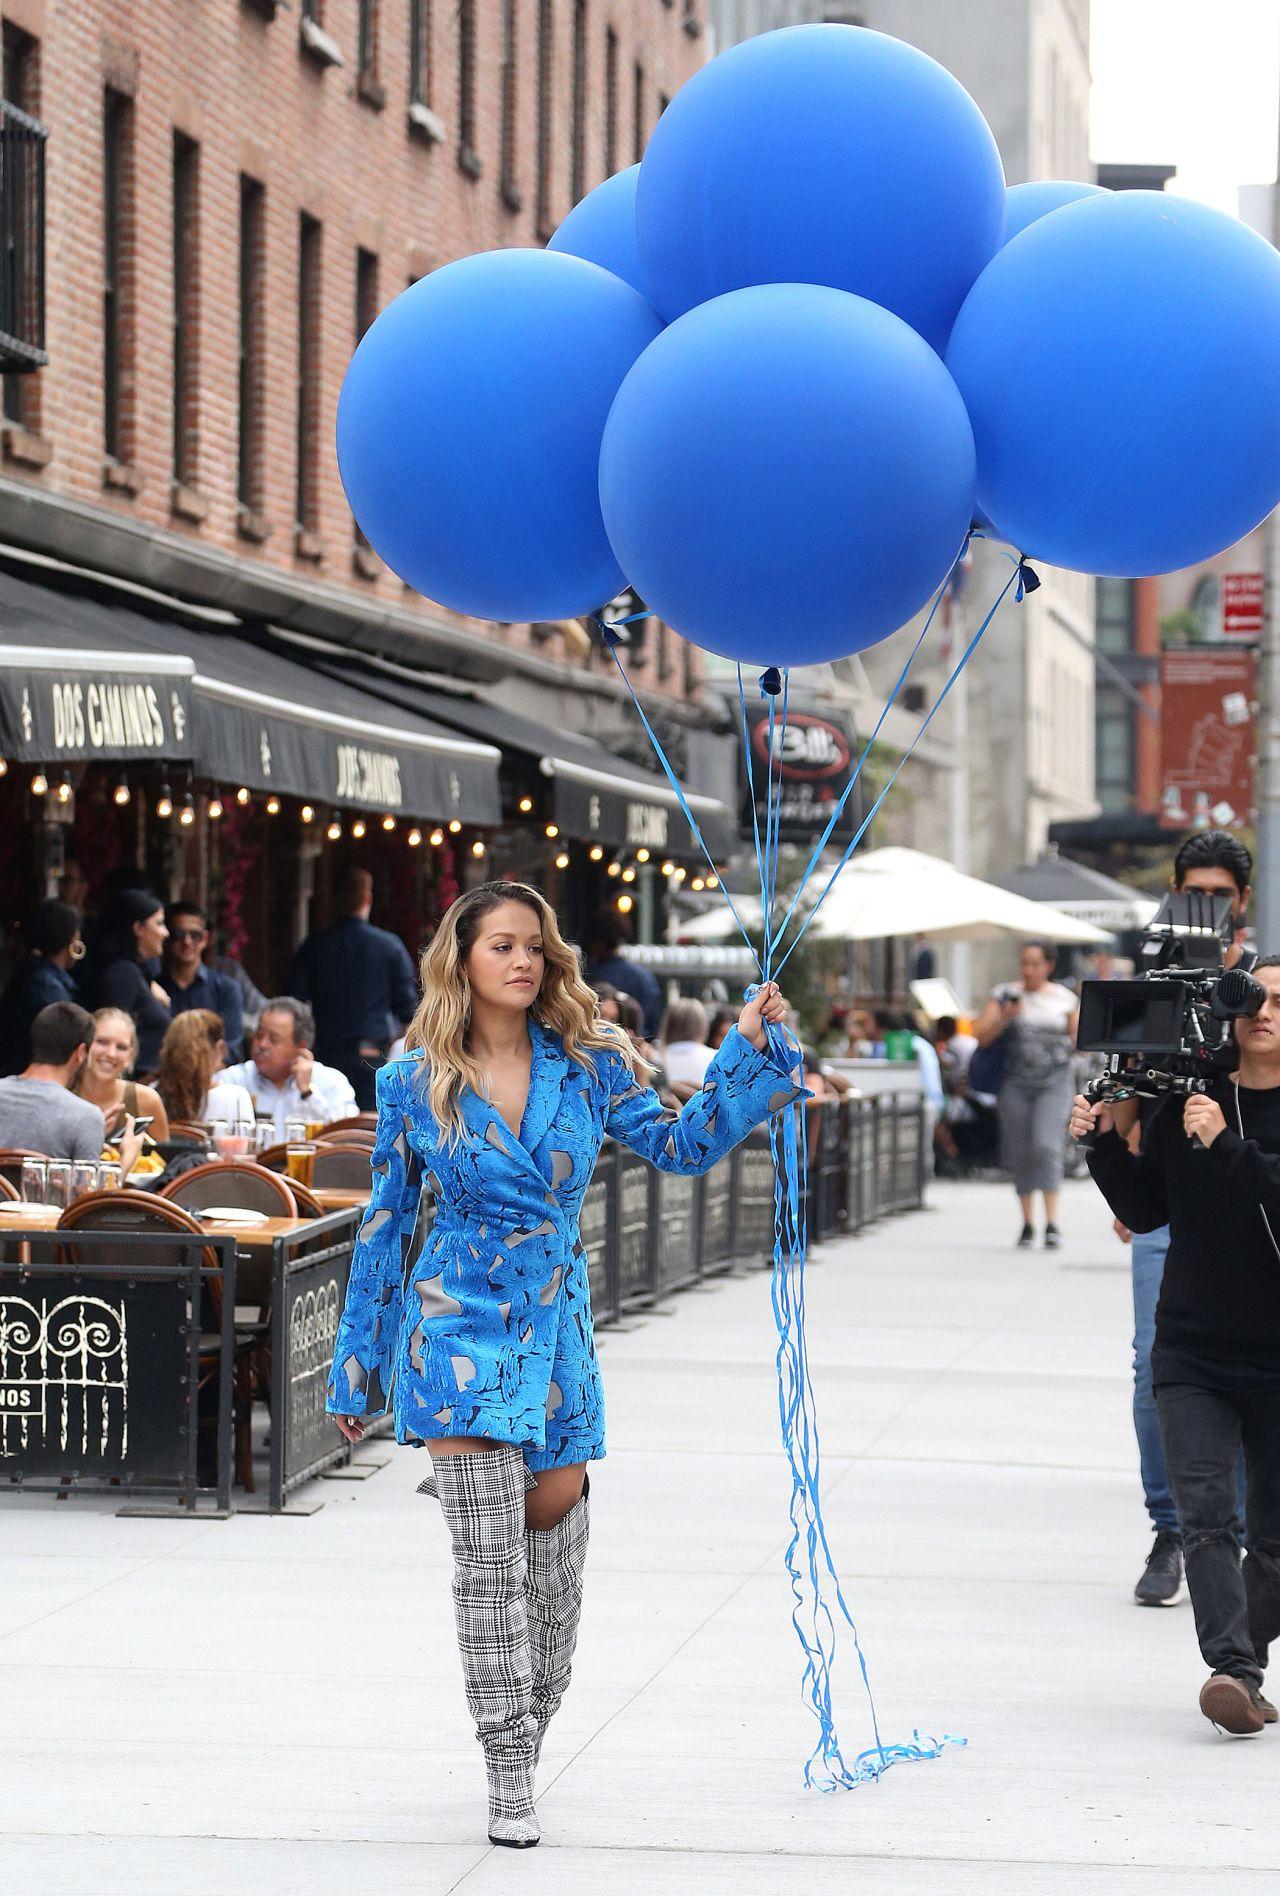 rita-ora-filming-a-music-video-in-new-york-city-10-05-2017-18.jpg